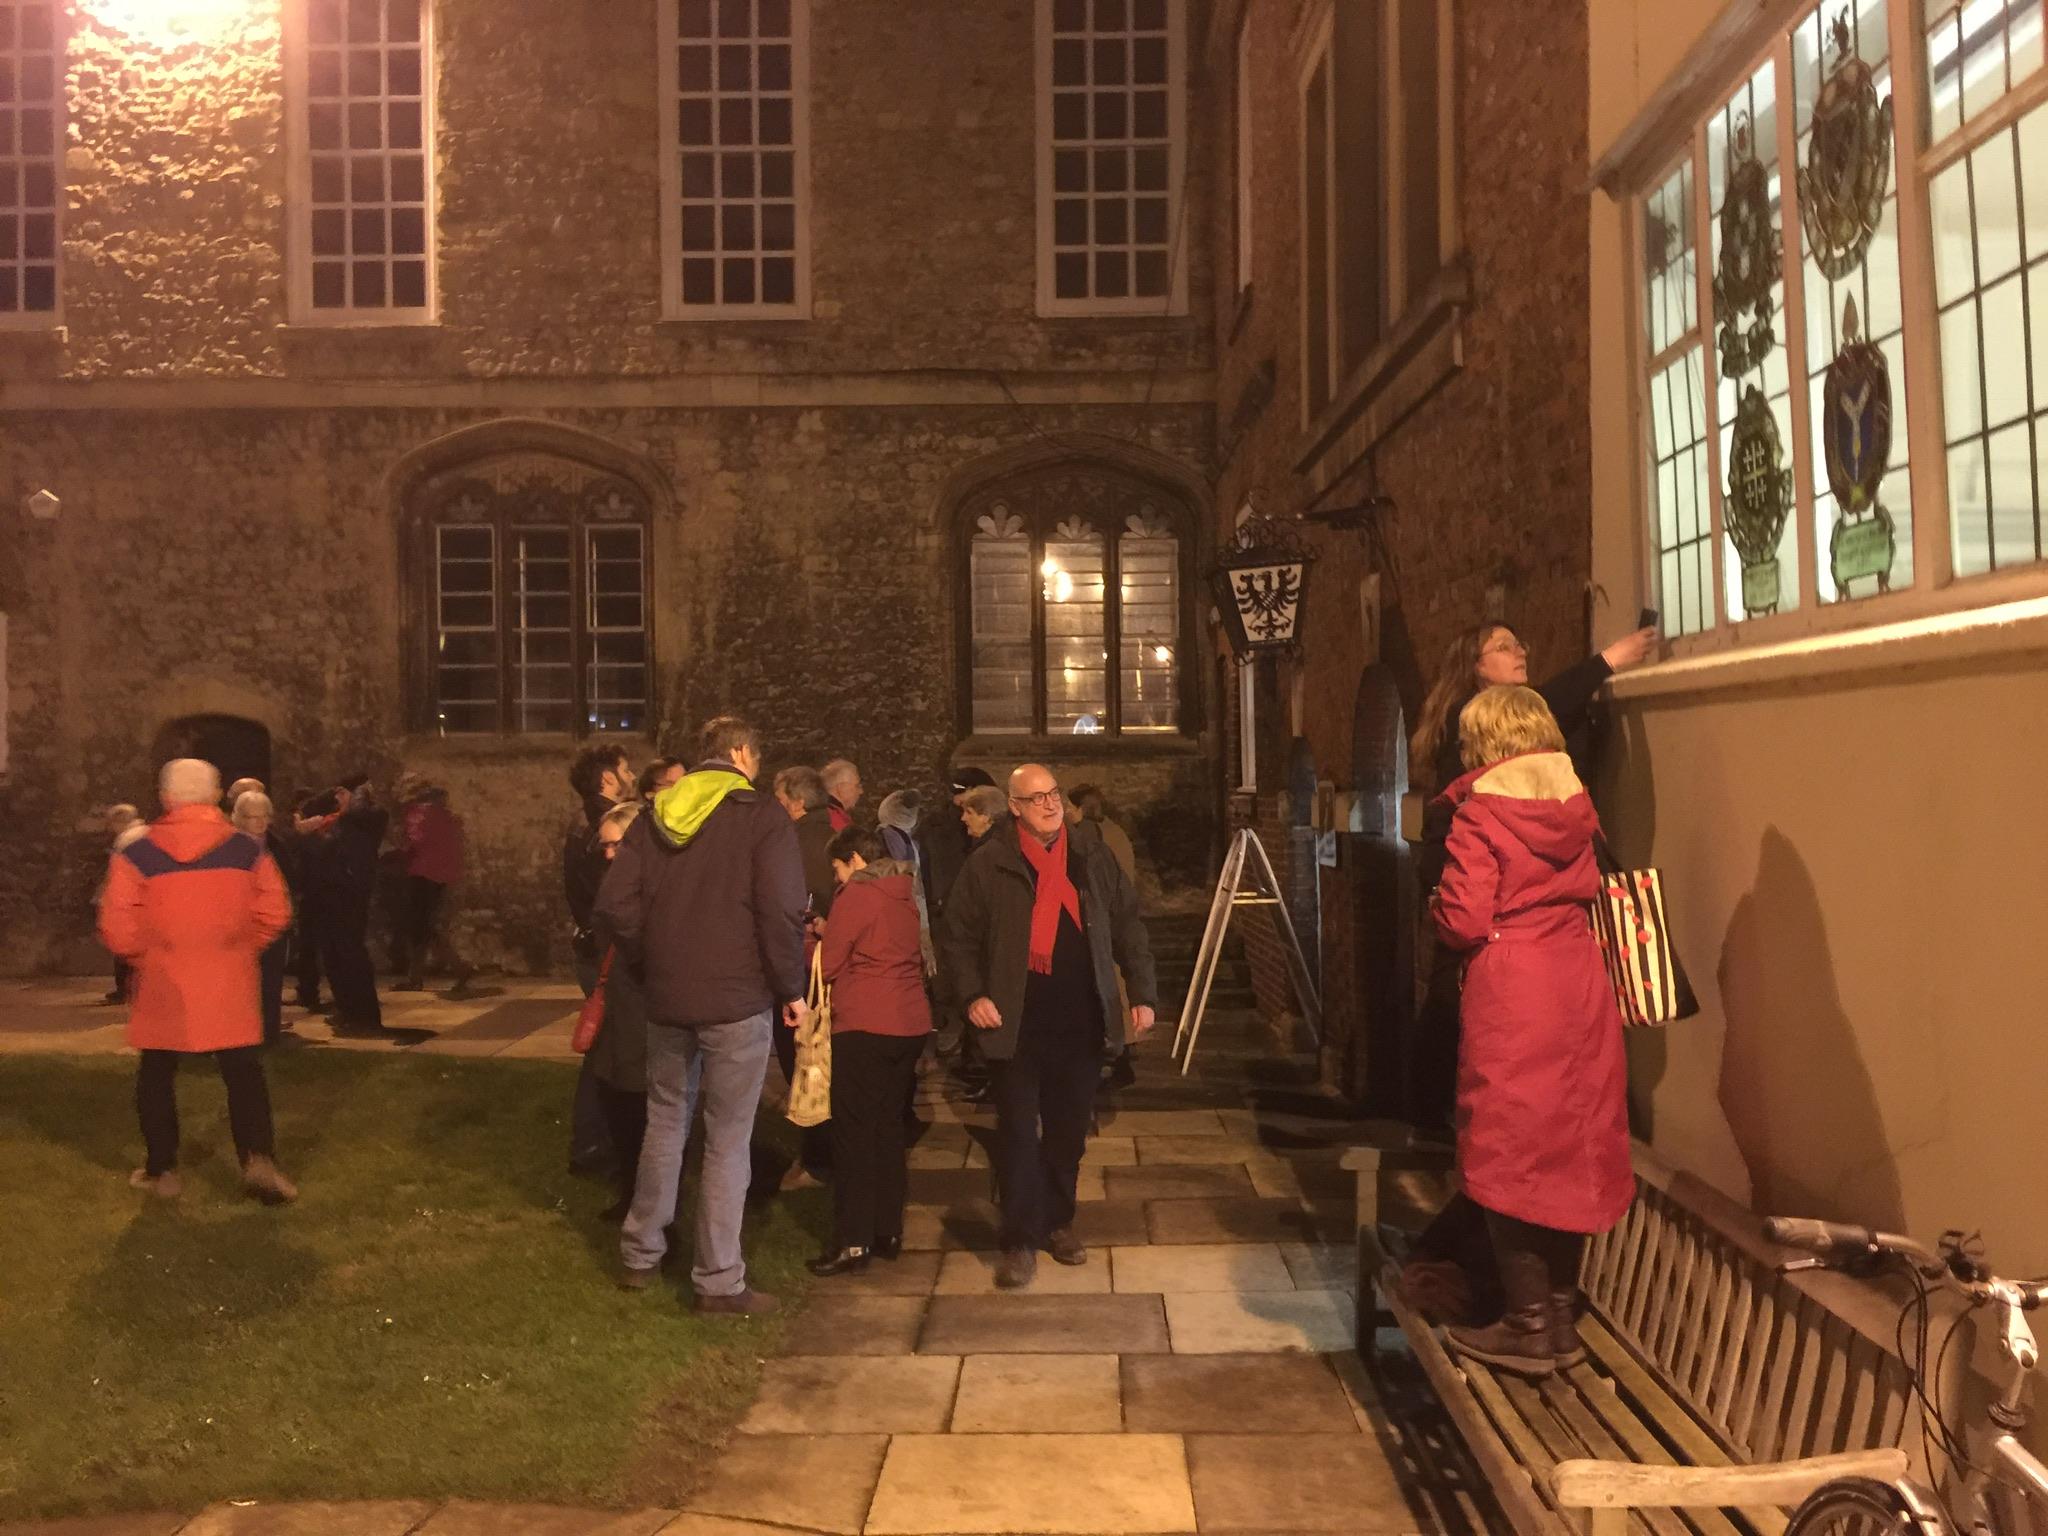 Parishioners of Abingdon, outside Monday's meeting